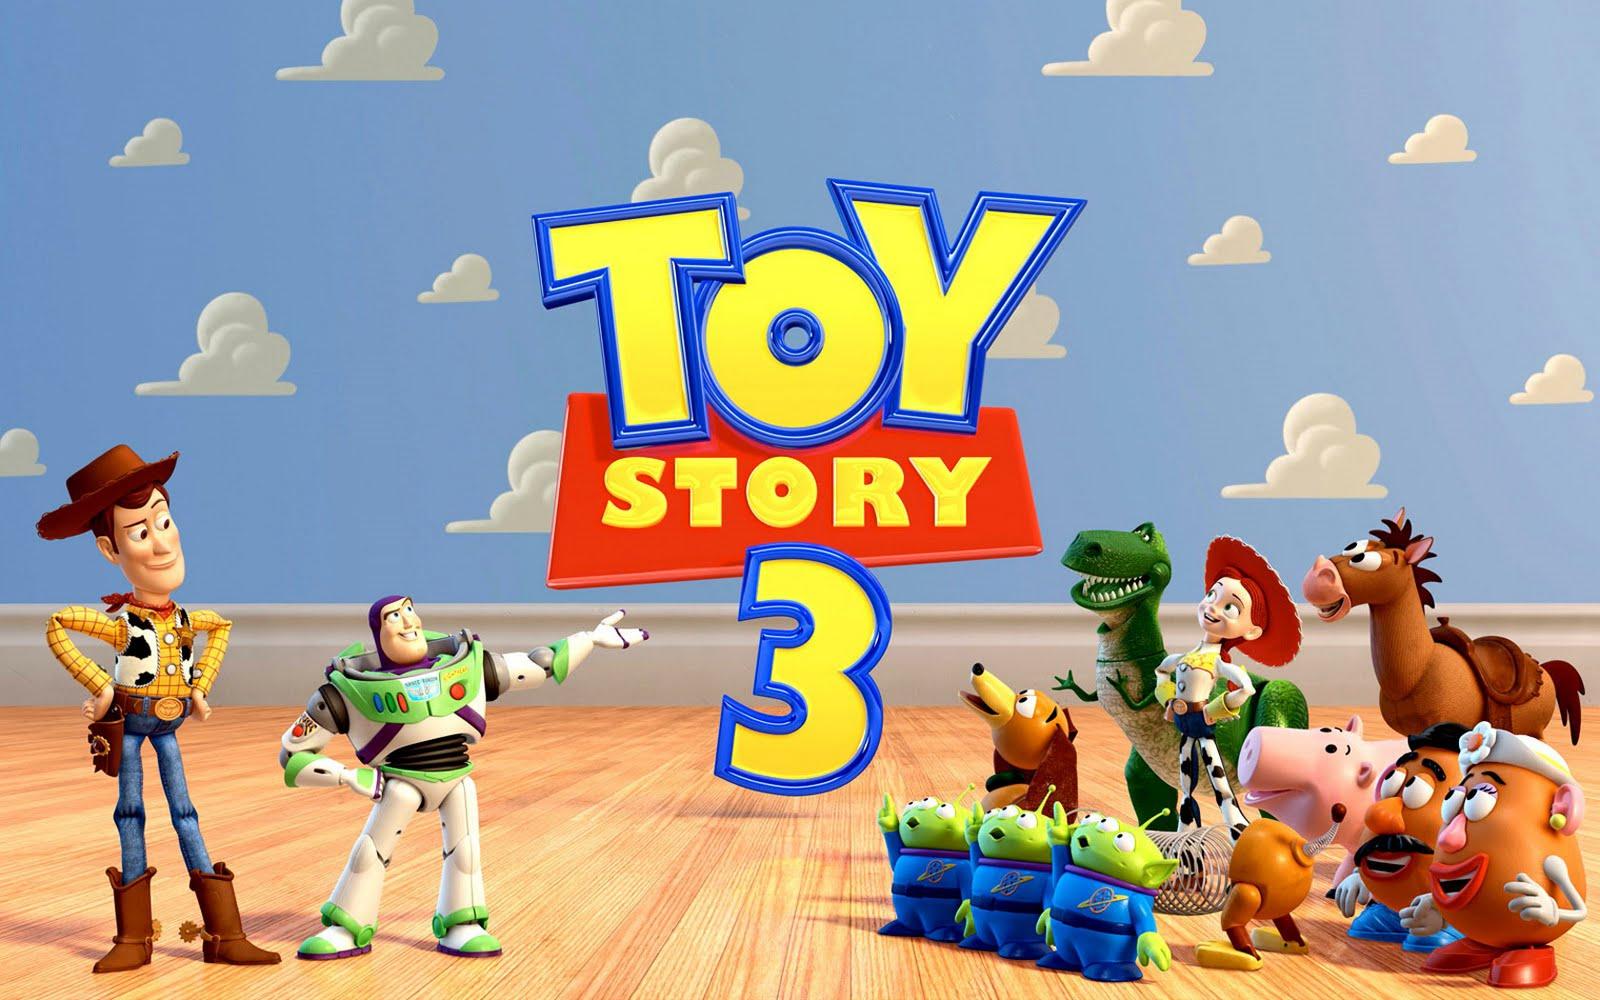 http://3.bp.blogspot.com/_gwZPzvkTLNI/TDJrf2lvUCI/AAAAAAAAB7Y/qnavkqkgljU/s1600/toy-story-3-1893.jpg